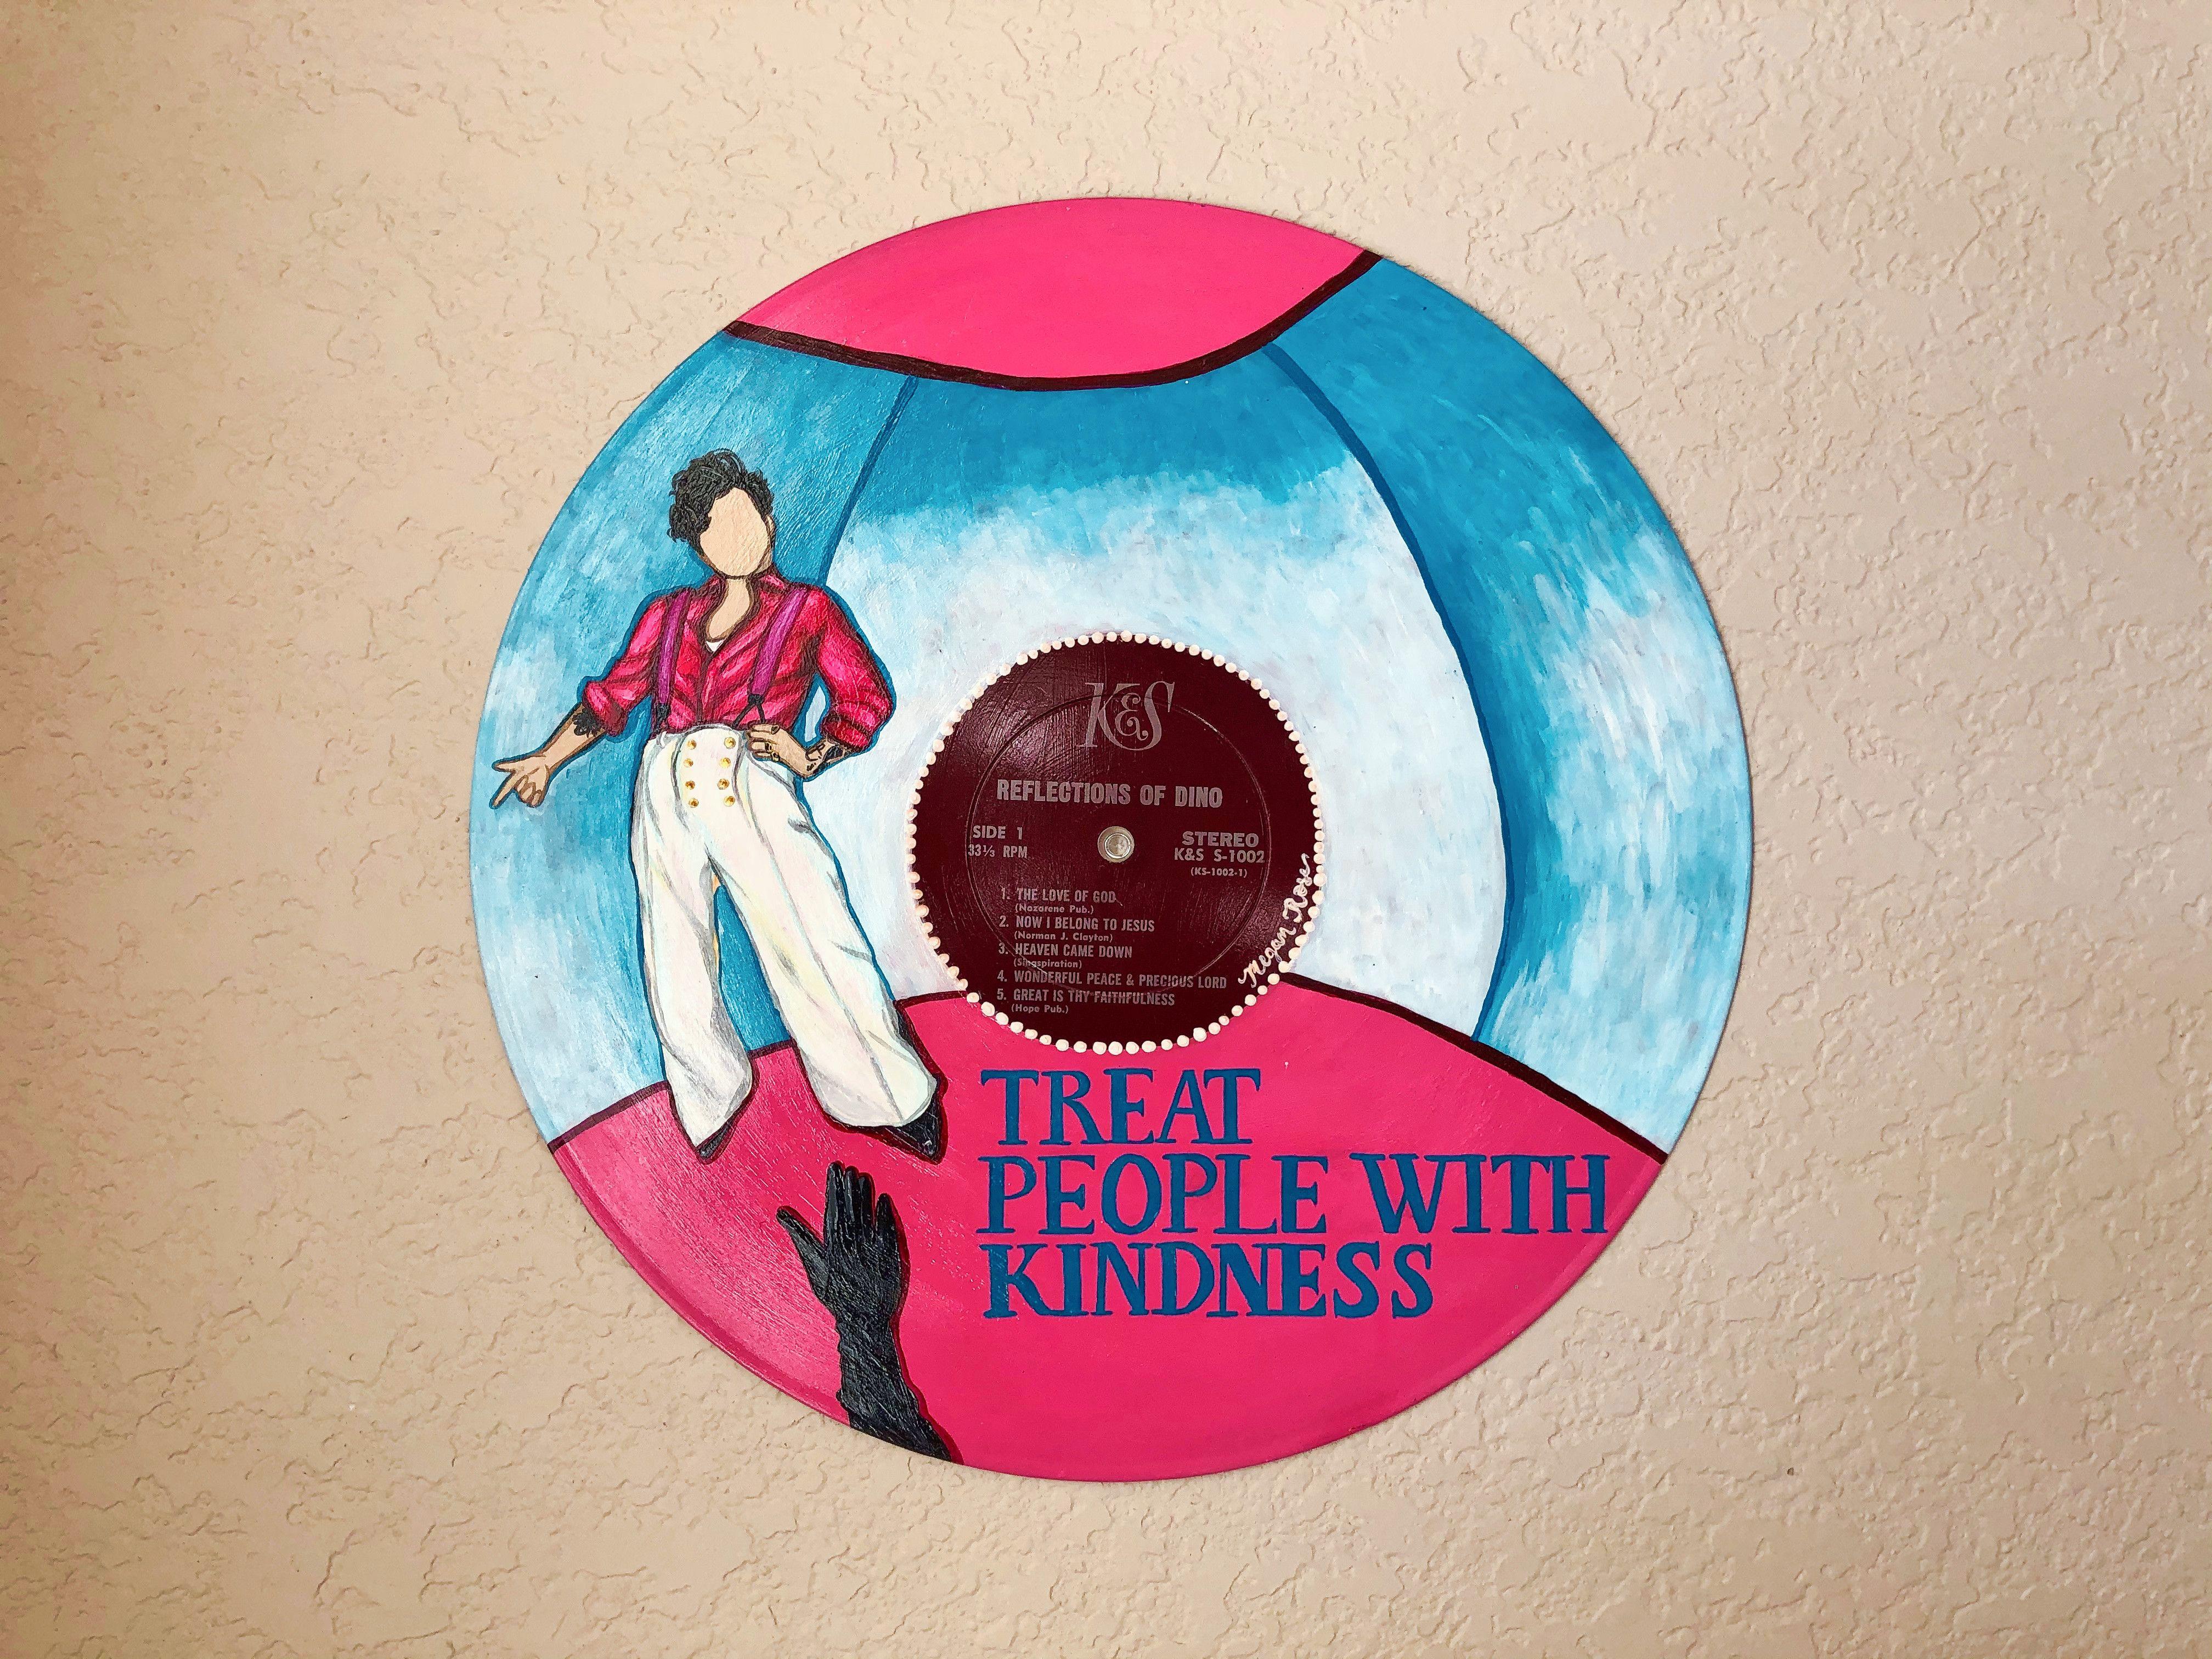 Harry Styles Fine Line Painted Vinyl Etsy In 2020 Vinyl Record Art Vinyl Record Art Ideas Vinyl Art Paint